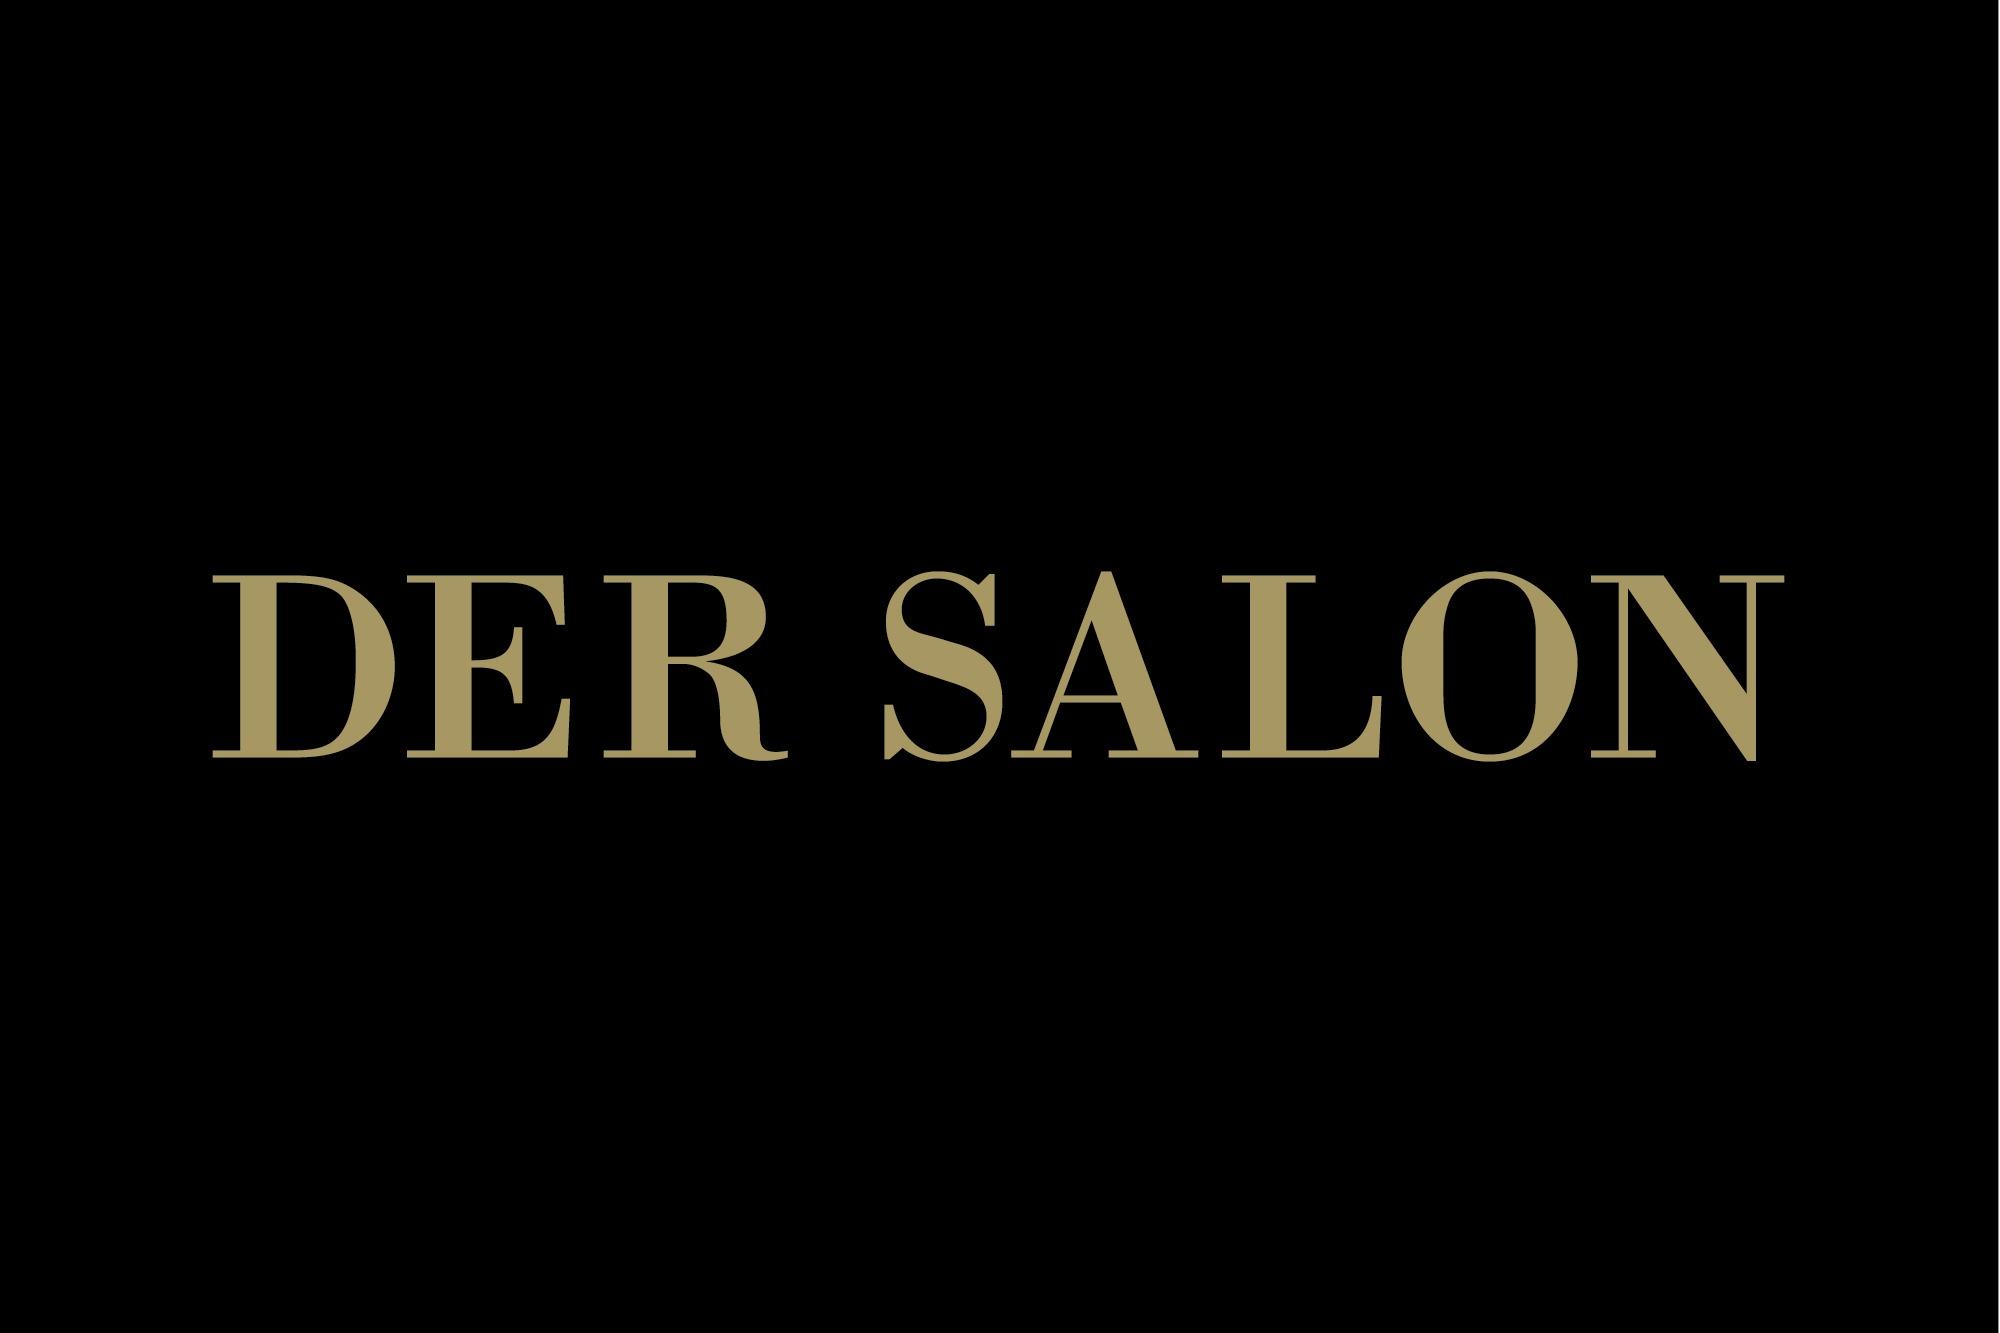 Studio dos, Grafikdesign Osnabrück, Der Salon Logo